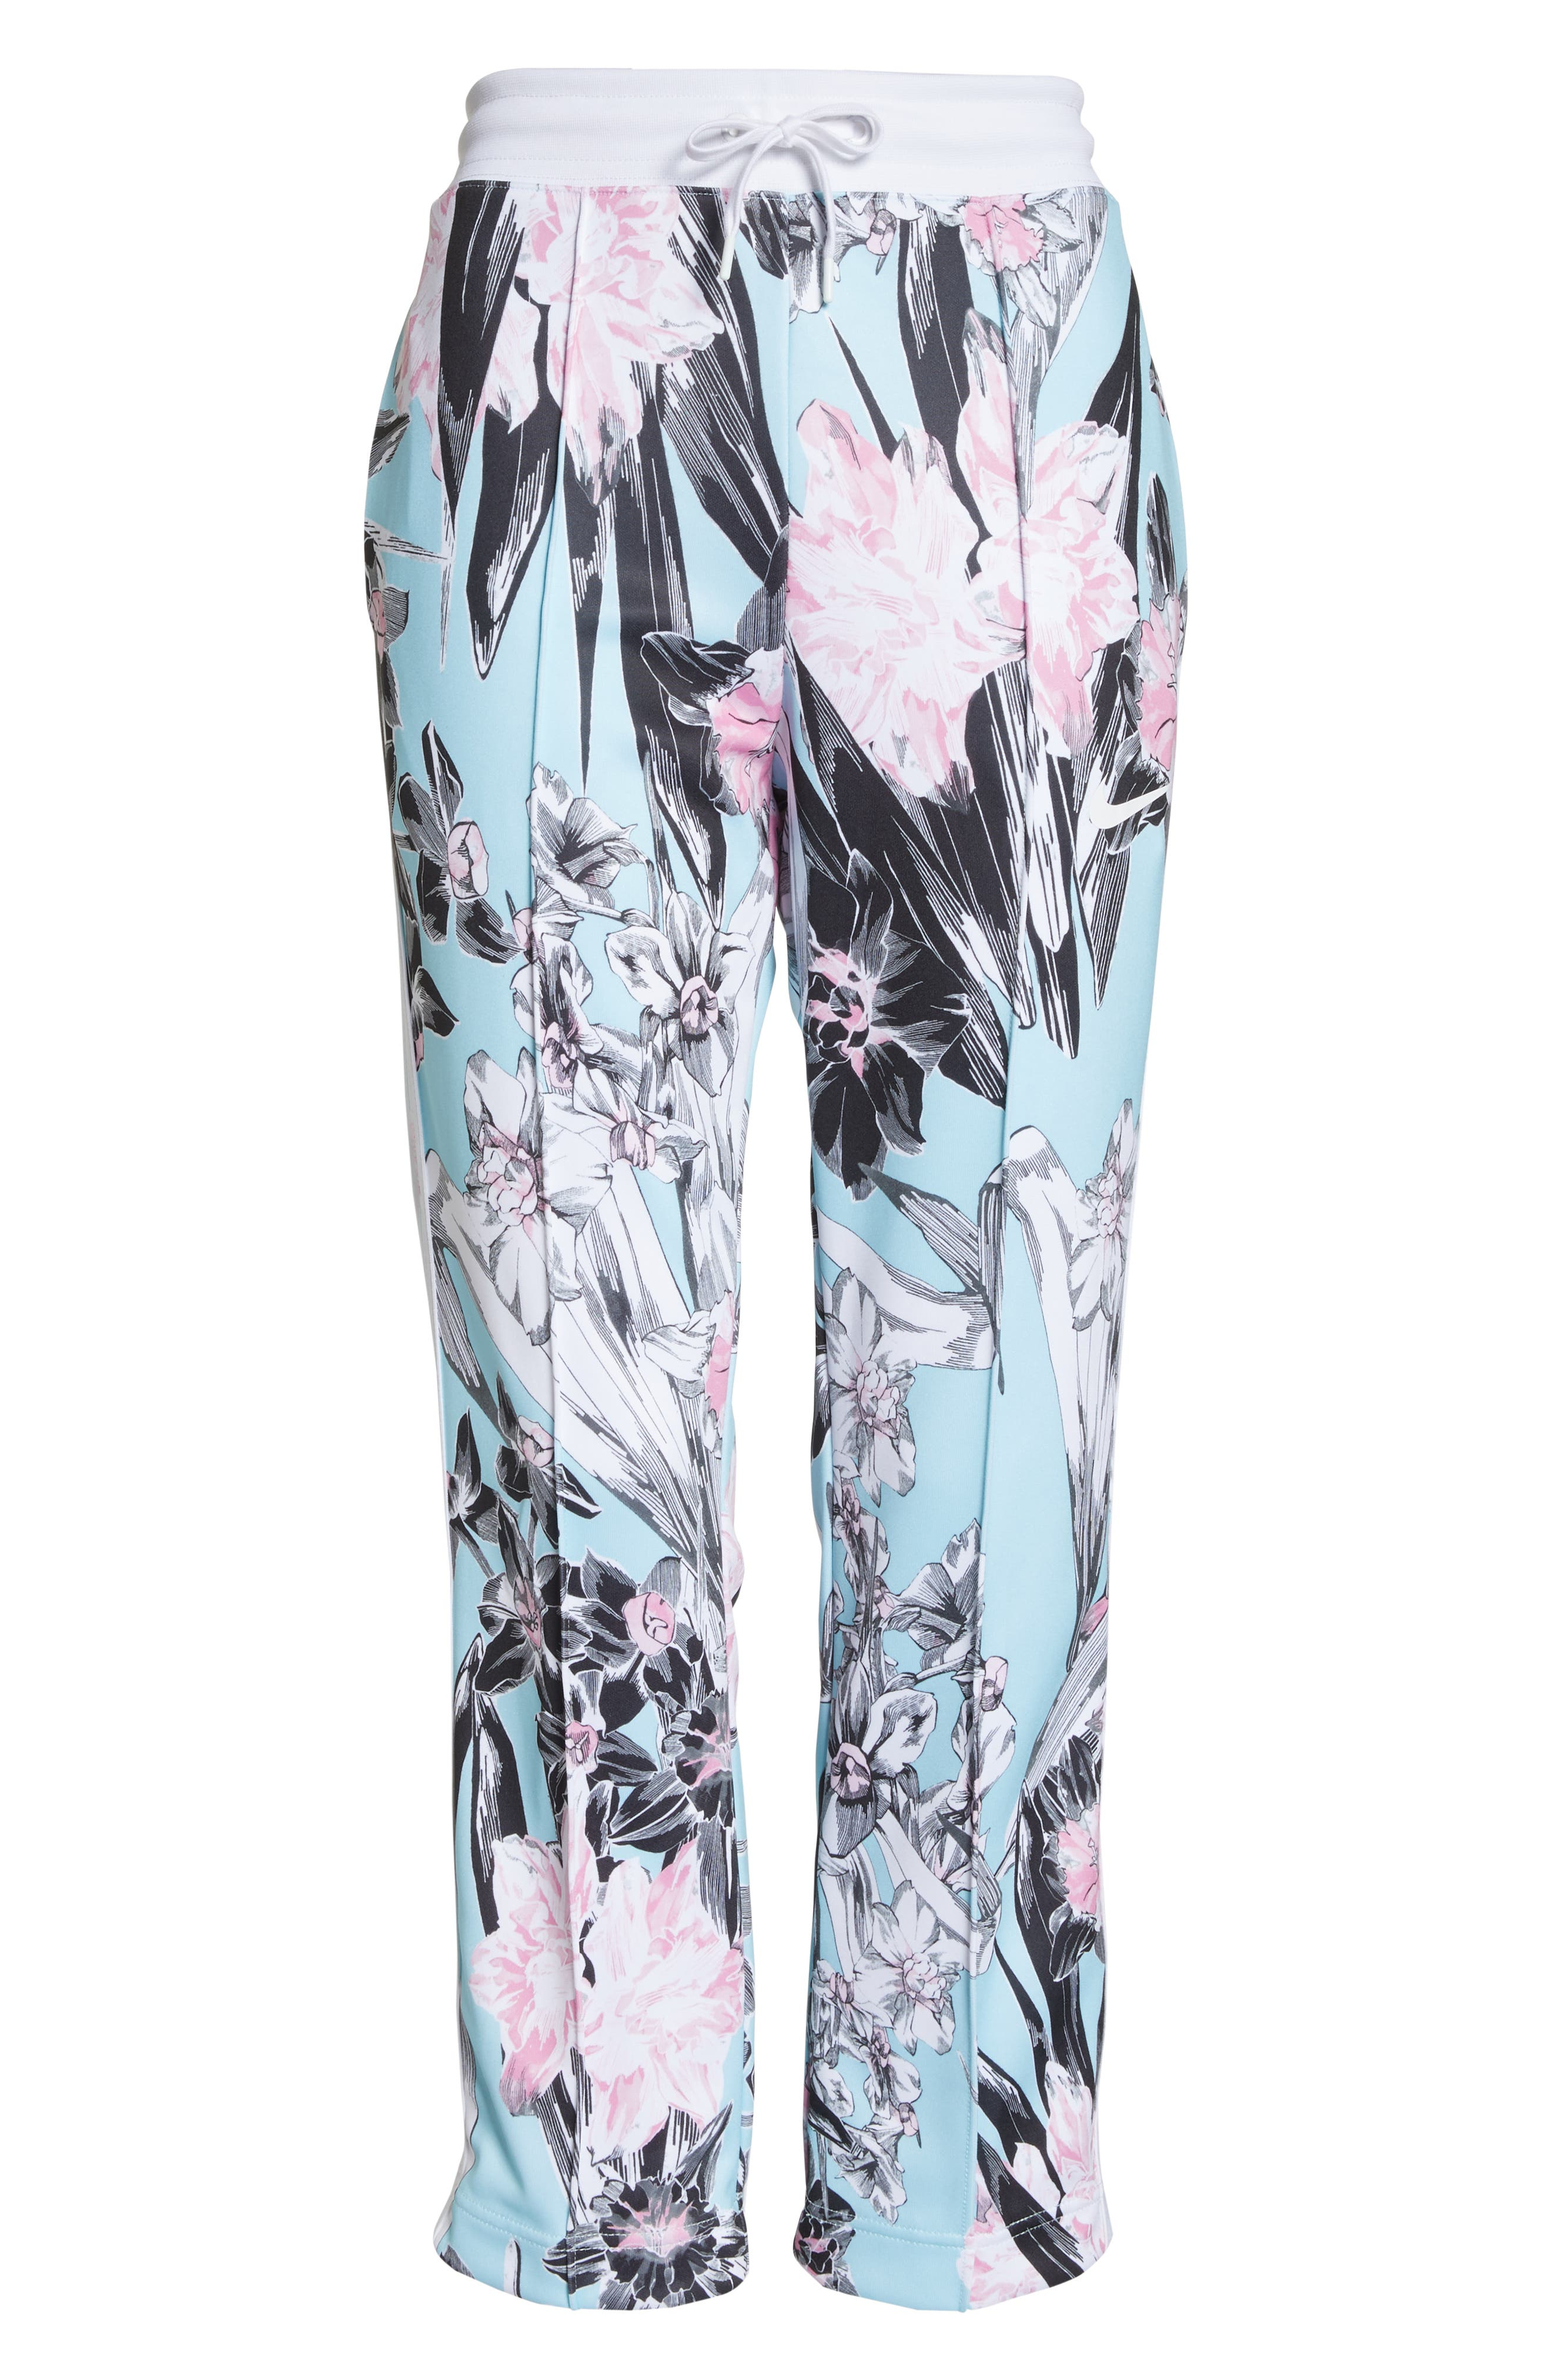 NIKE, Sportswear Floral Print Pants, Alternate thumbnail 8, color, TOPAZ MIST/ WHITE/ WHITE